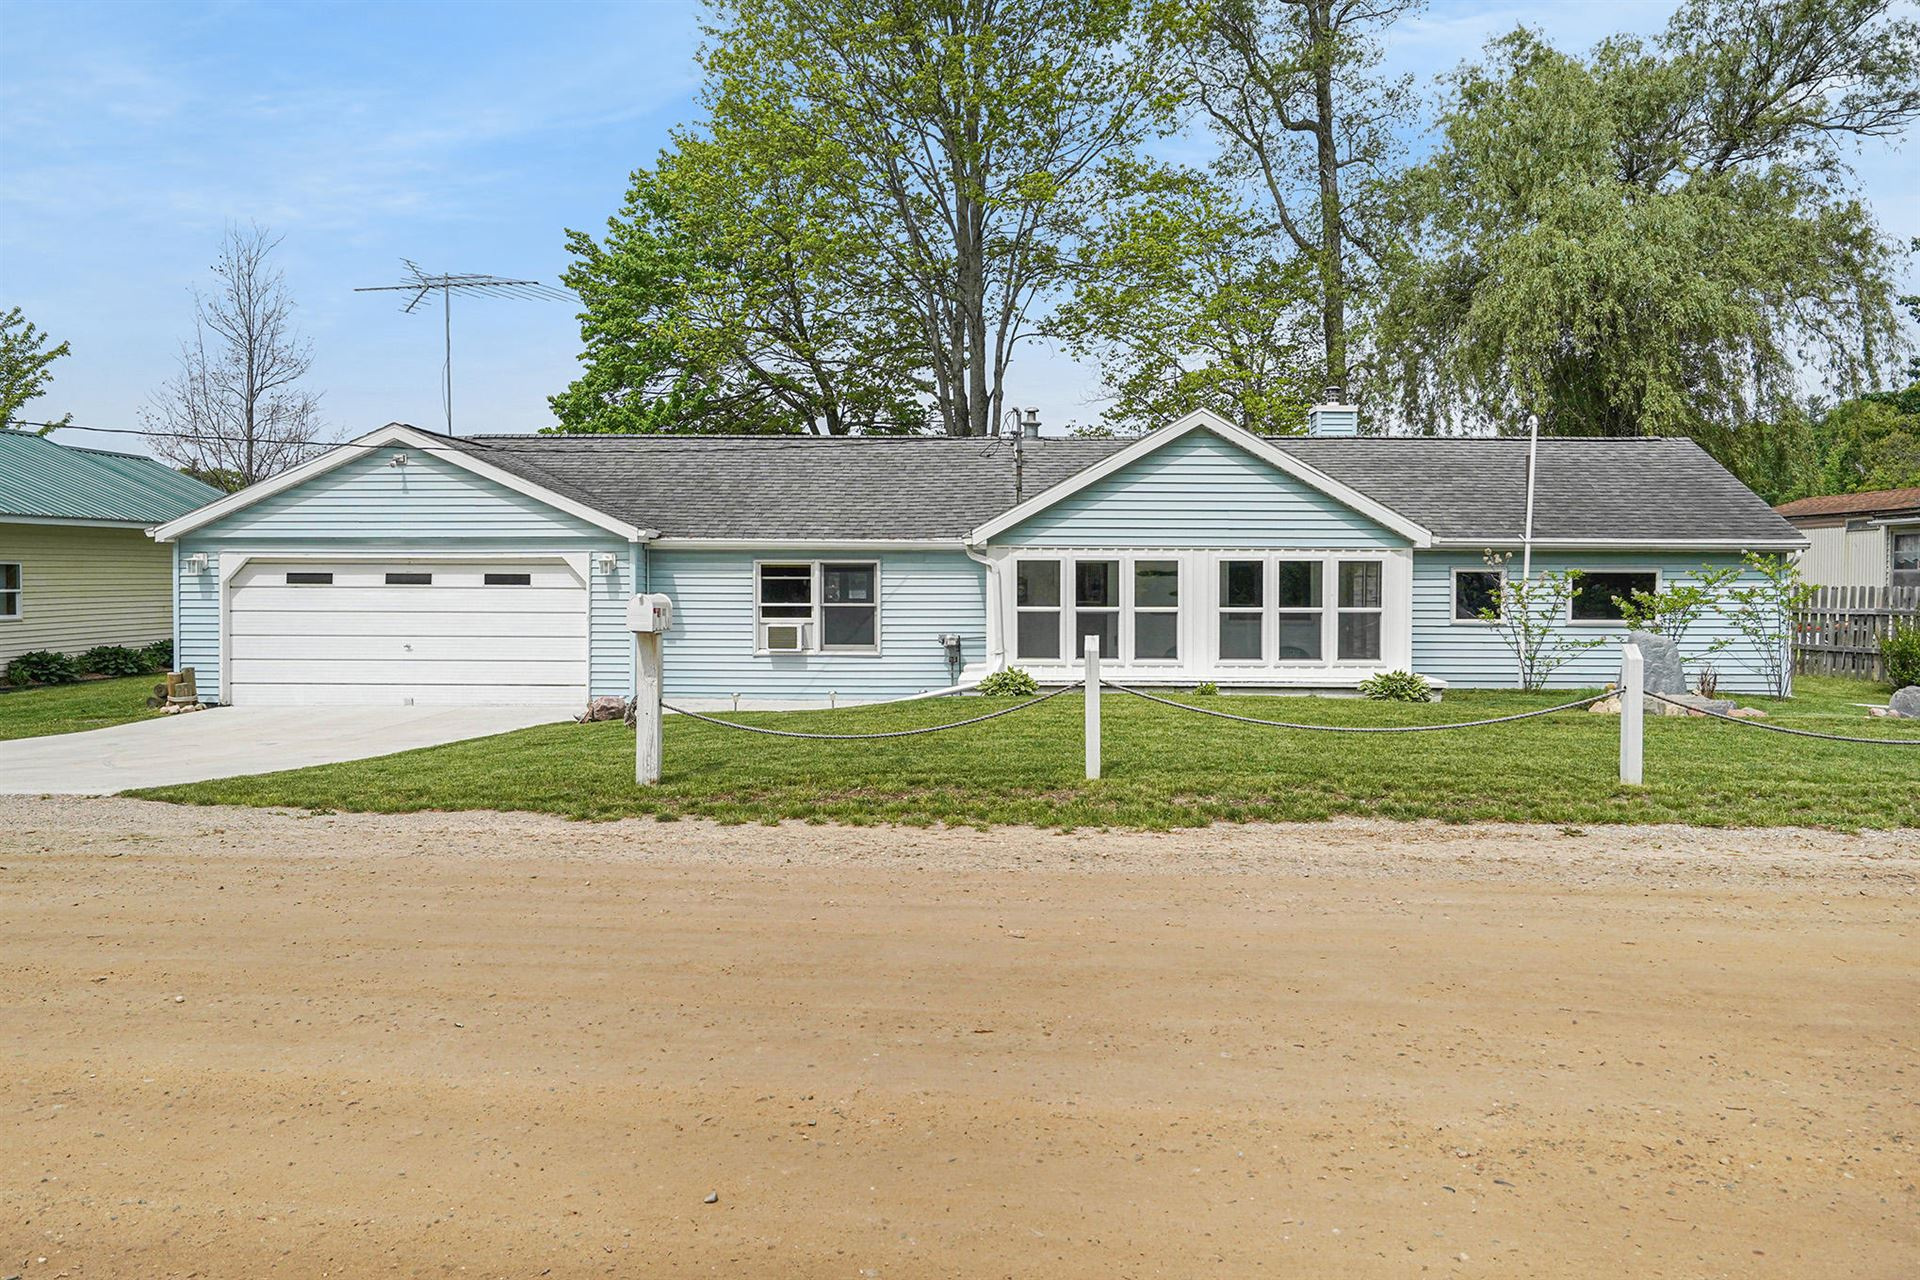 1031 S Coolidge Avenue, Six Lakes, MI 48886 - MLS#: 21020022